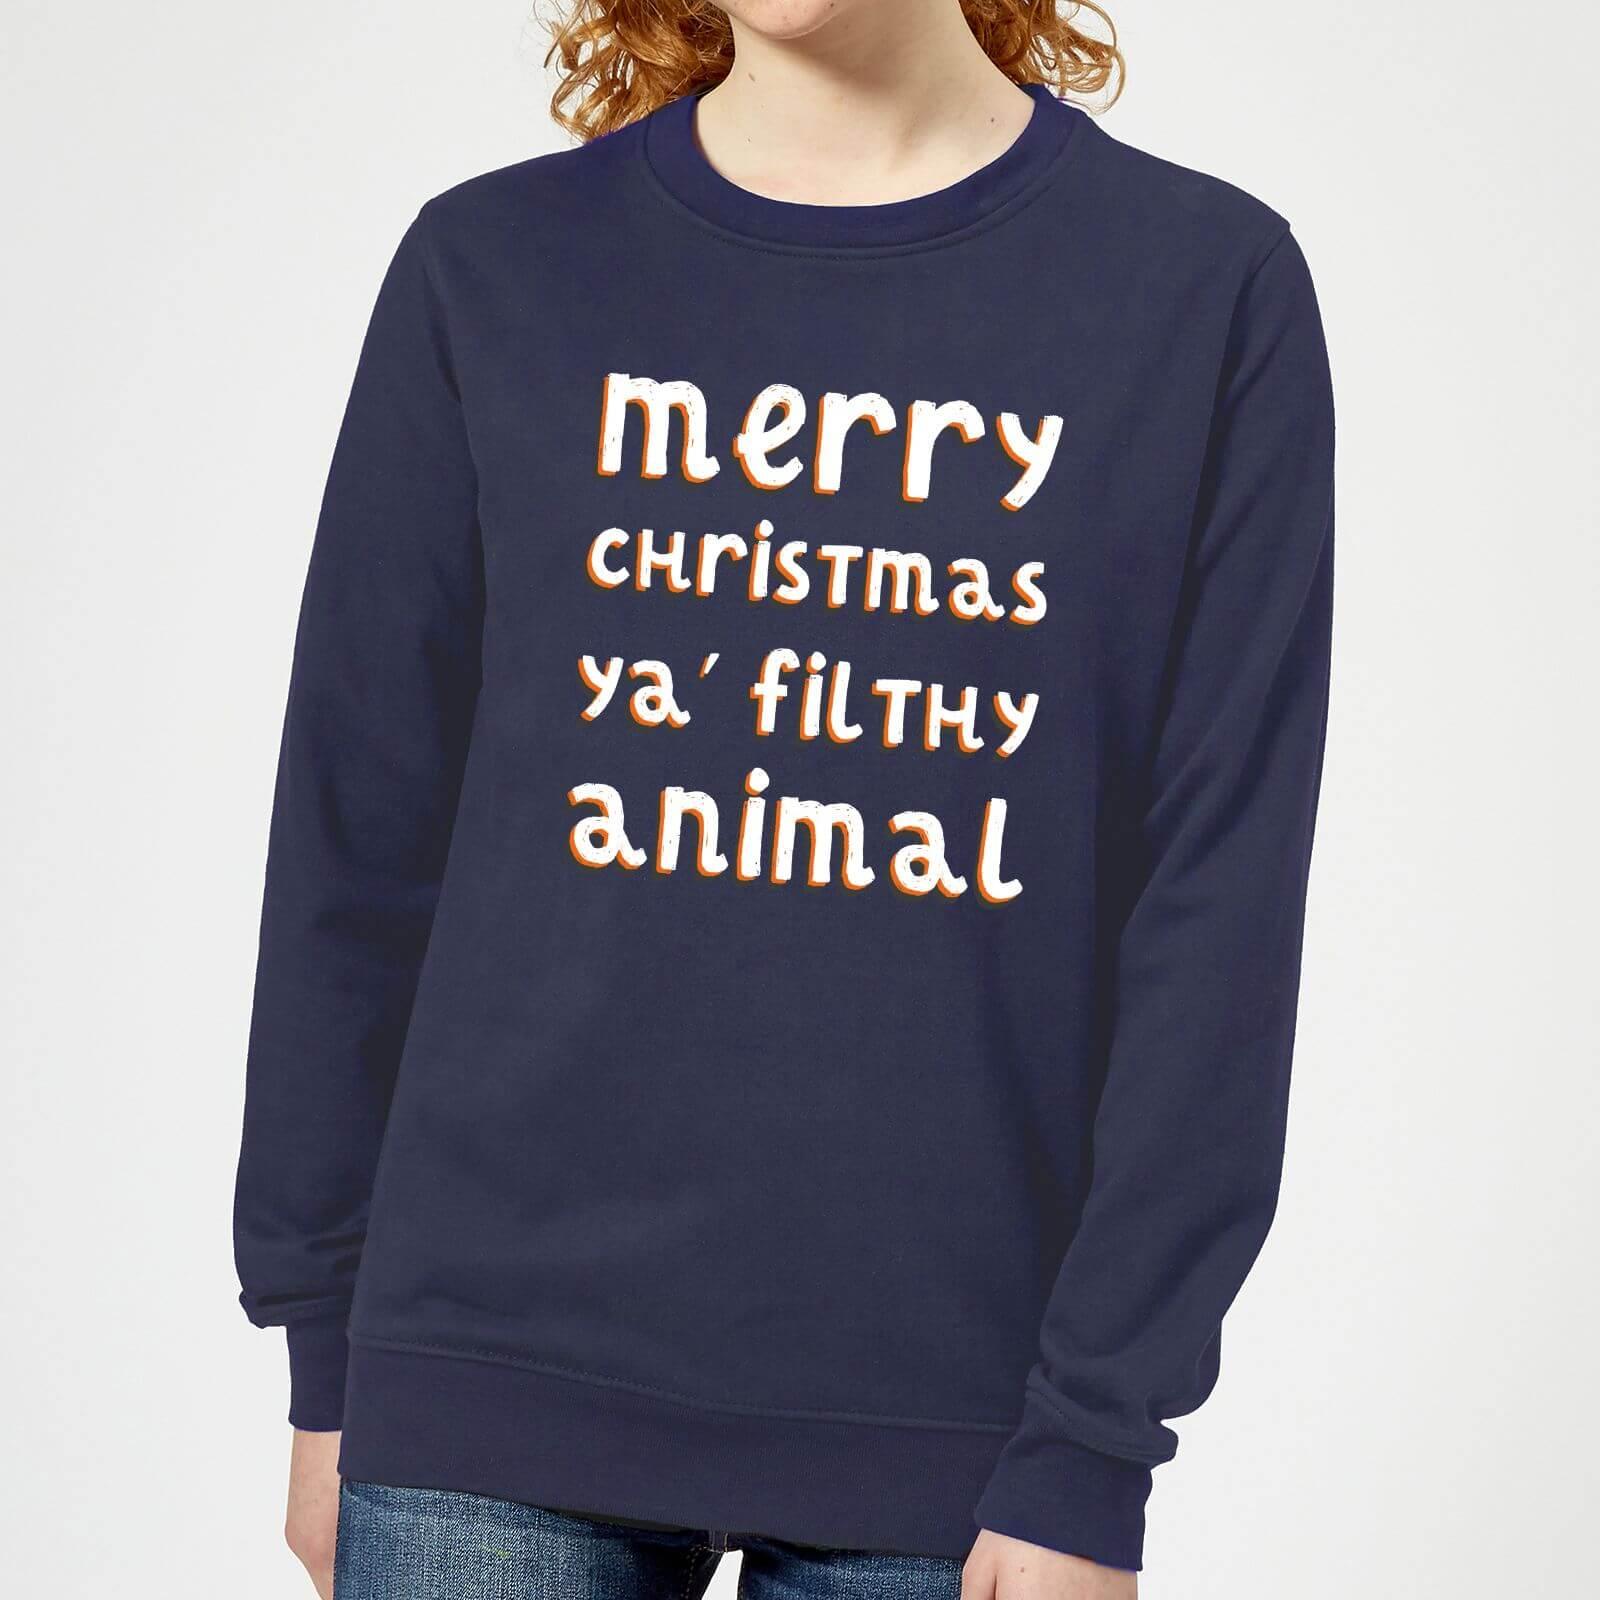 Kersttrui Dames Katoen.Merry Christmas Ya Filthy Animal Dames Kersttrui Navy Zavvi Nl